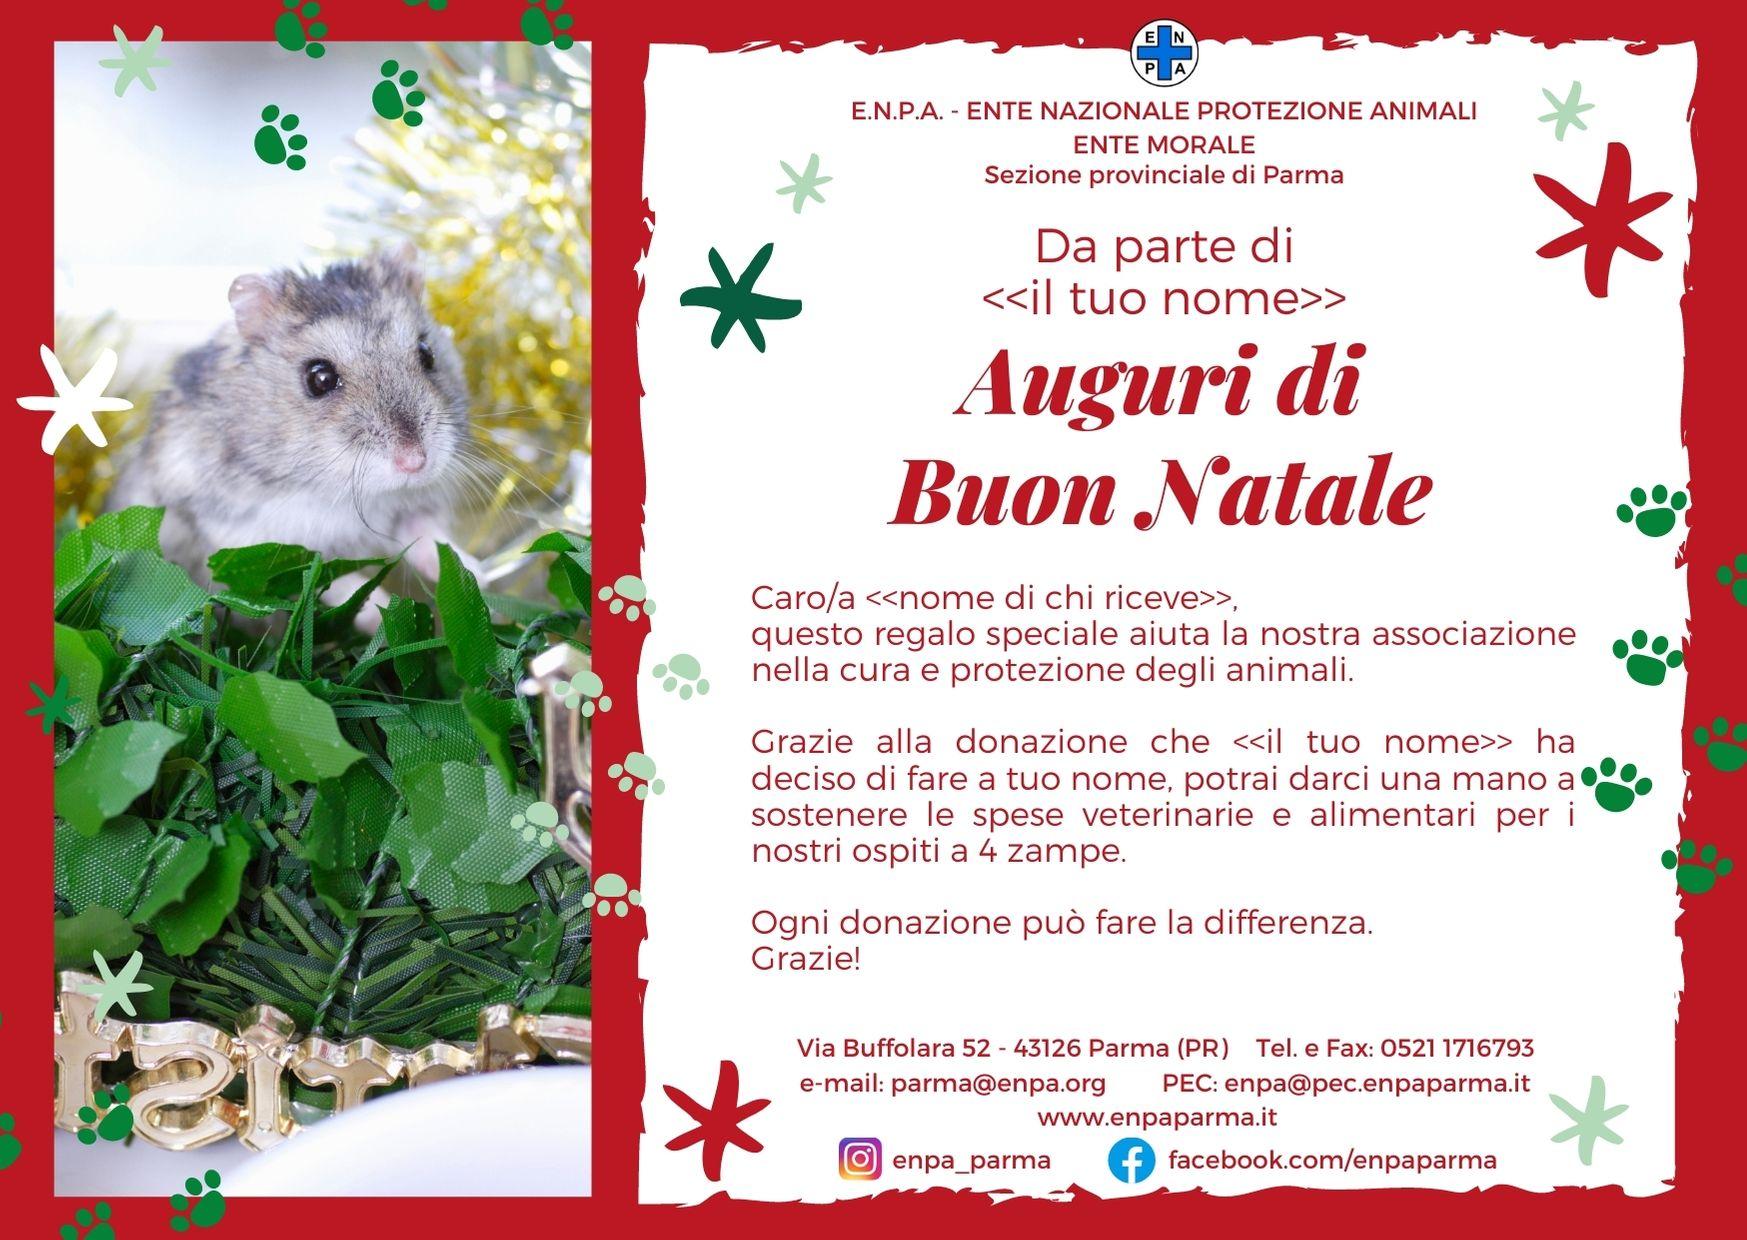 Natale Con ENPA (criceto - 5€)